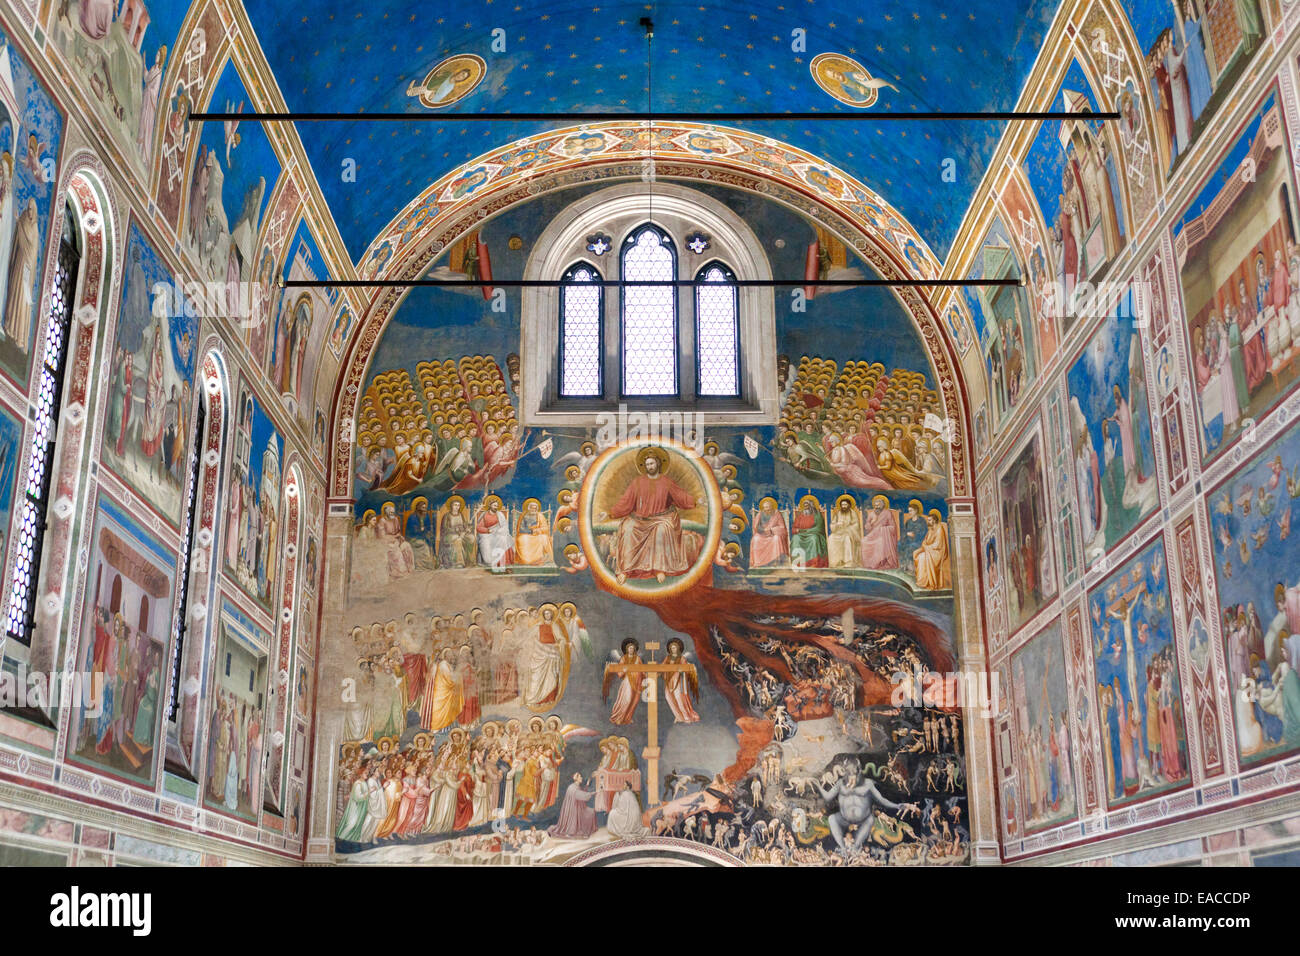 Die Scrovegni-Kapelle - Cappella Degli Scrovegni, Padua, Veneto, Italien Stockfoto